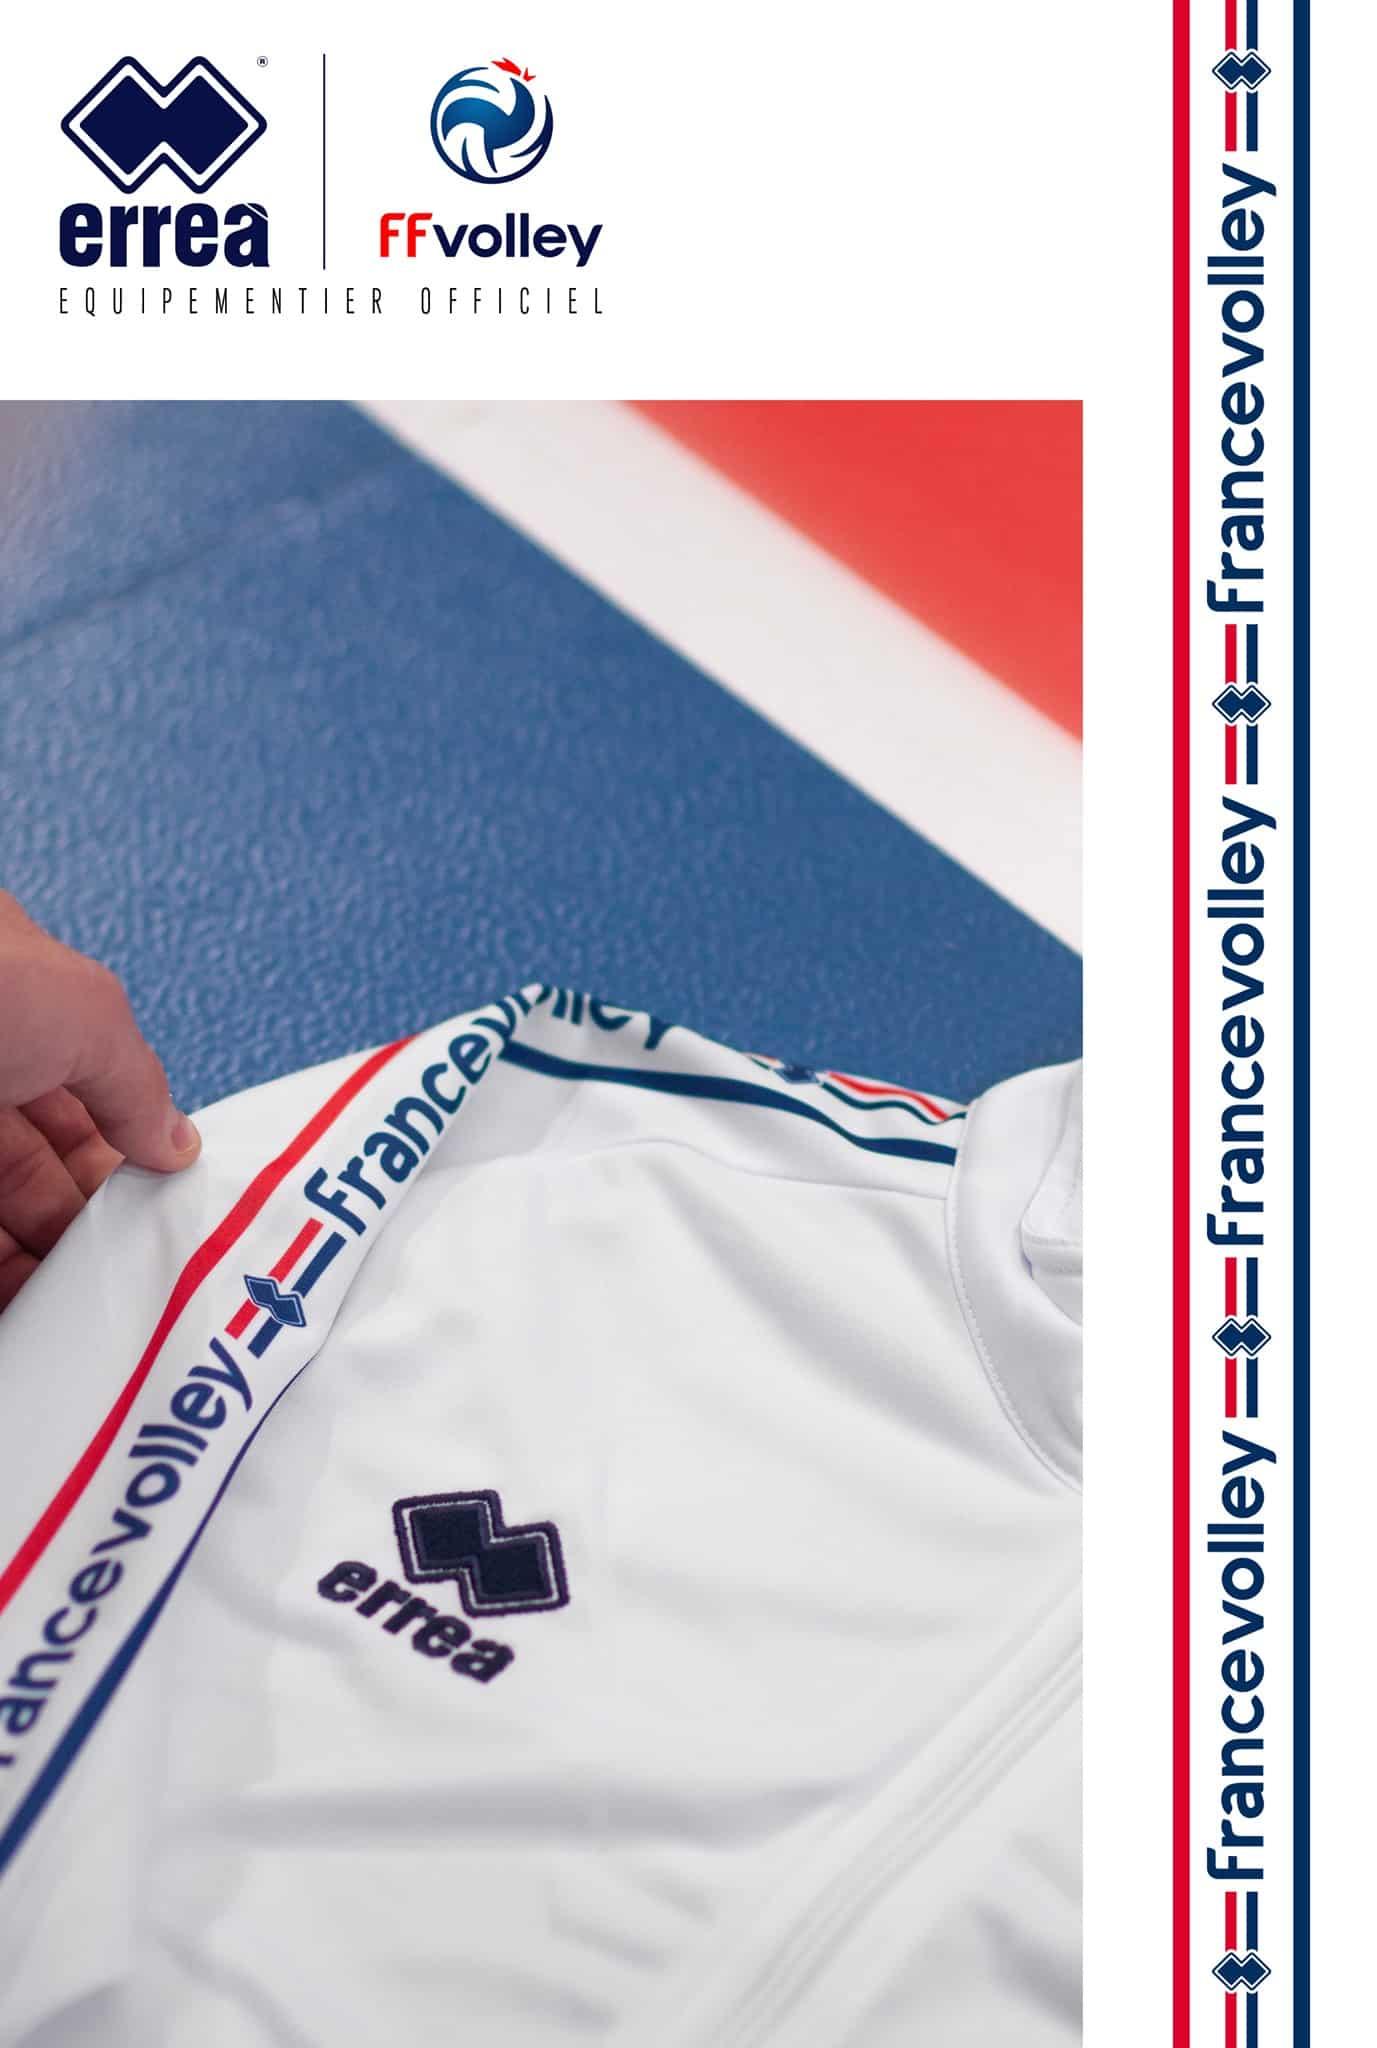 un-nouveau-maillot-errea-de-lequipe-de-france-de-volley-a-venir-6